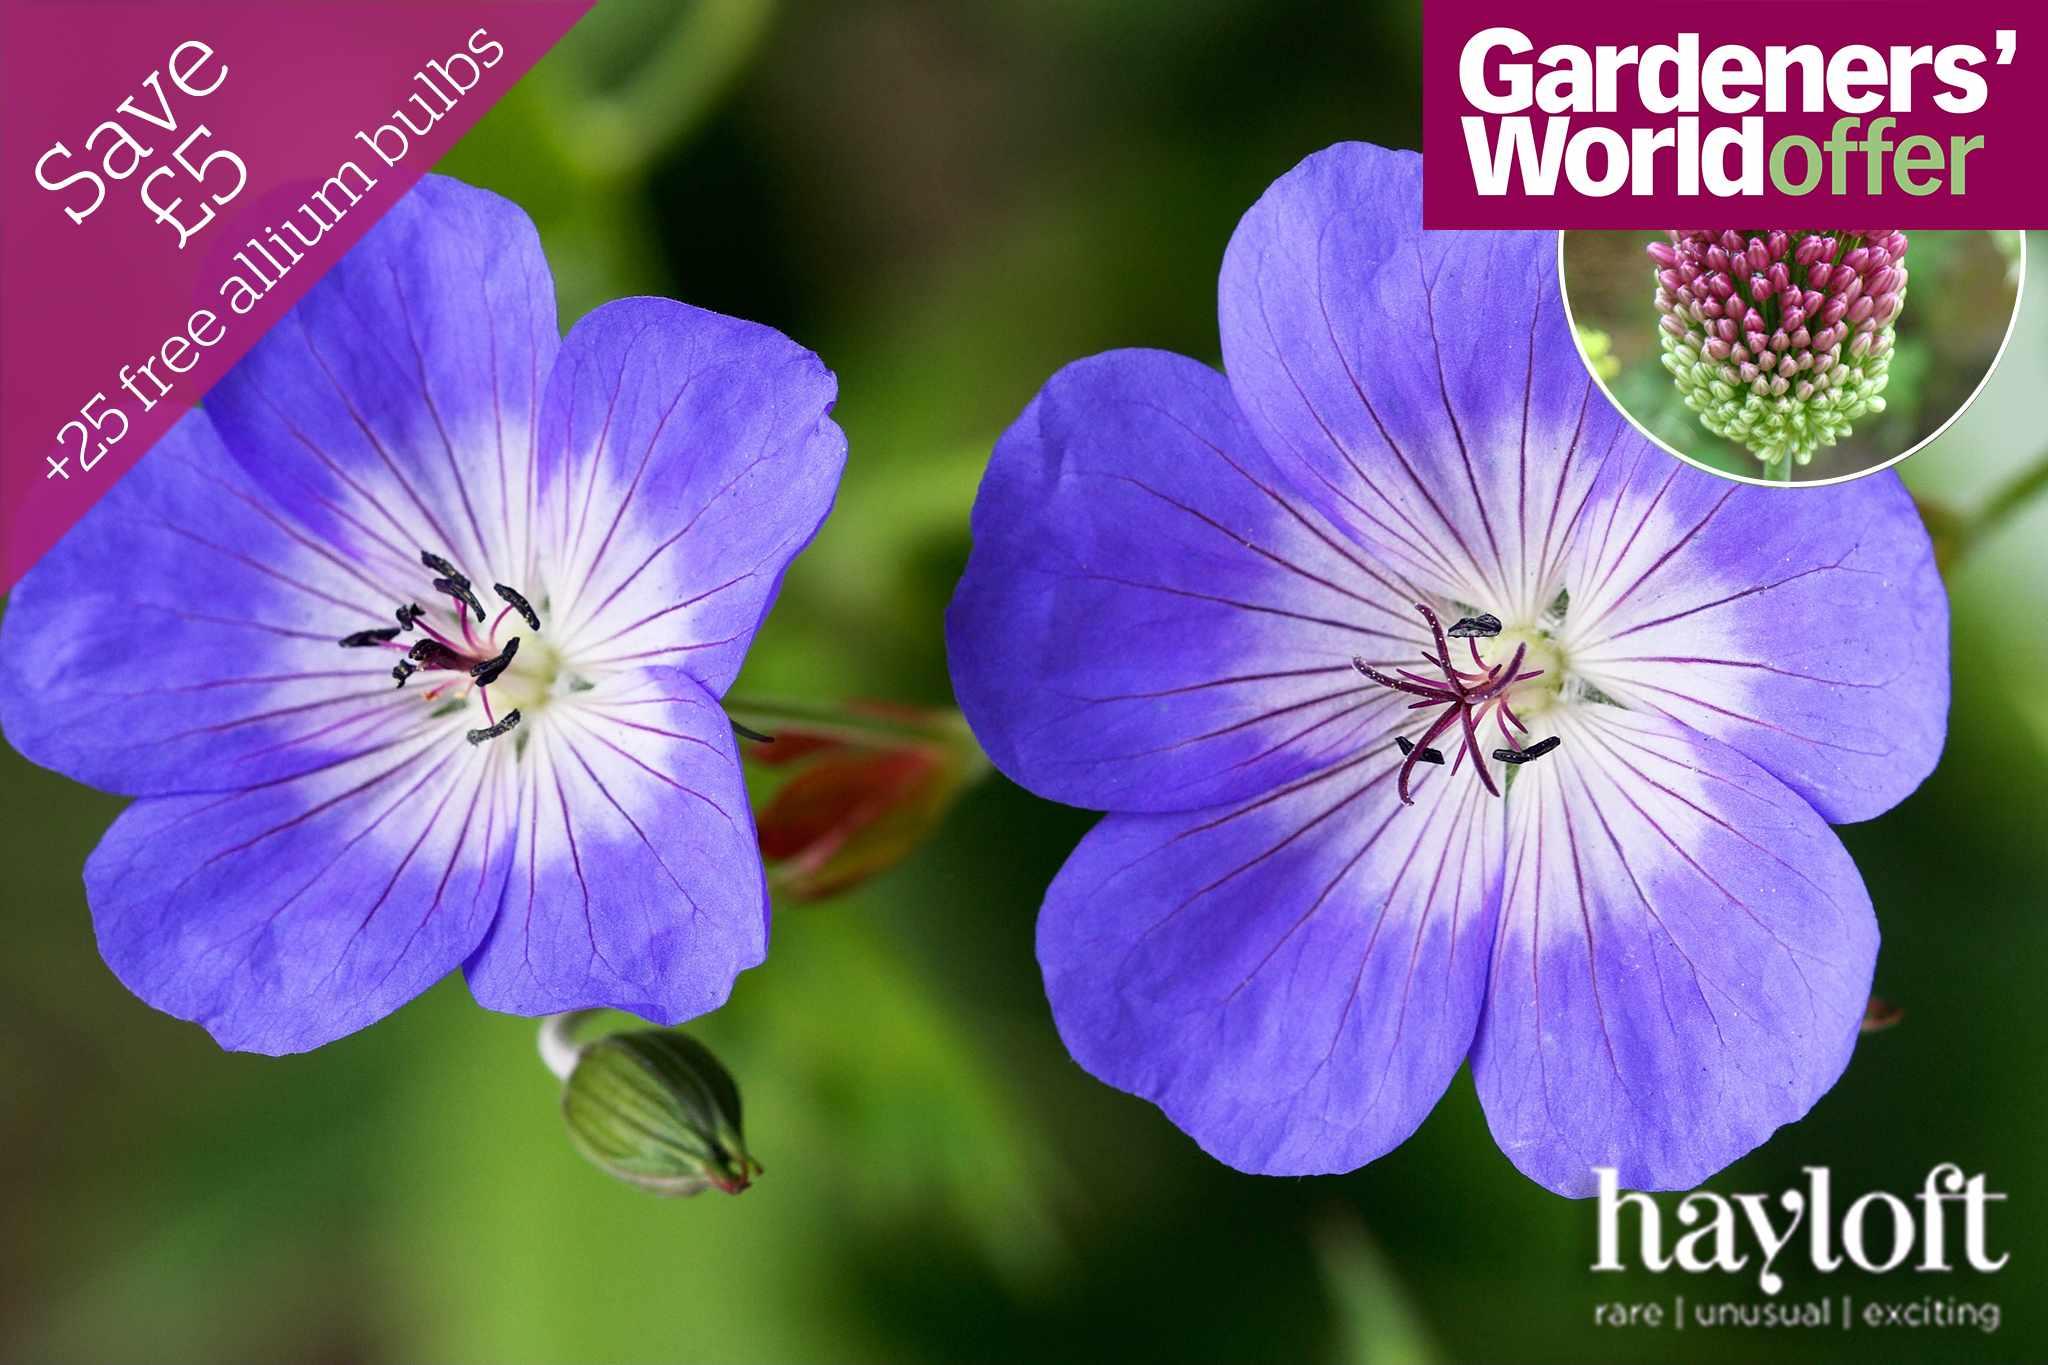 hayloft-hardy-geranium-rozanne-promo-2048-1365